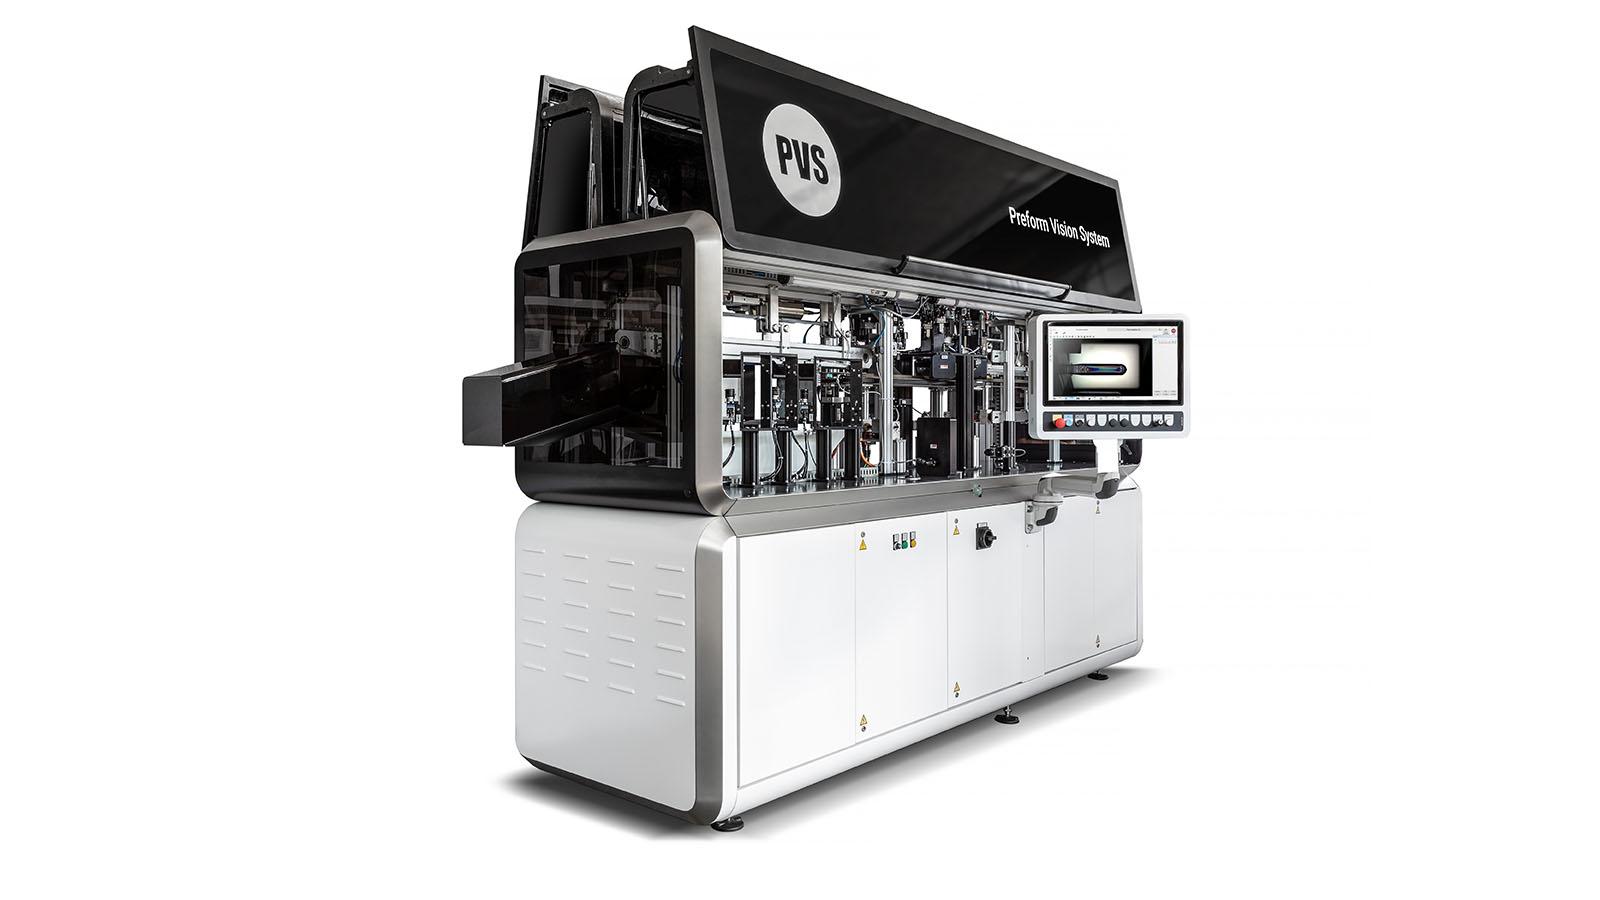 concept-design-pvs-macchina aperta